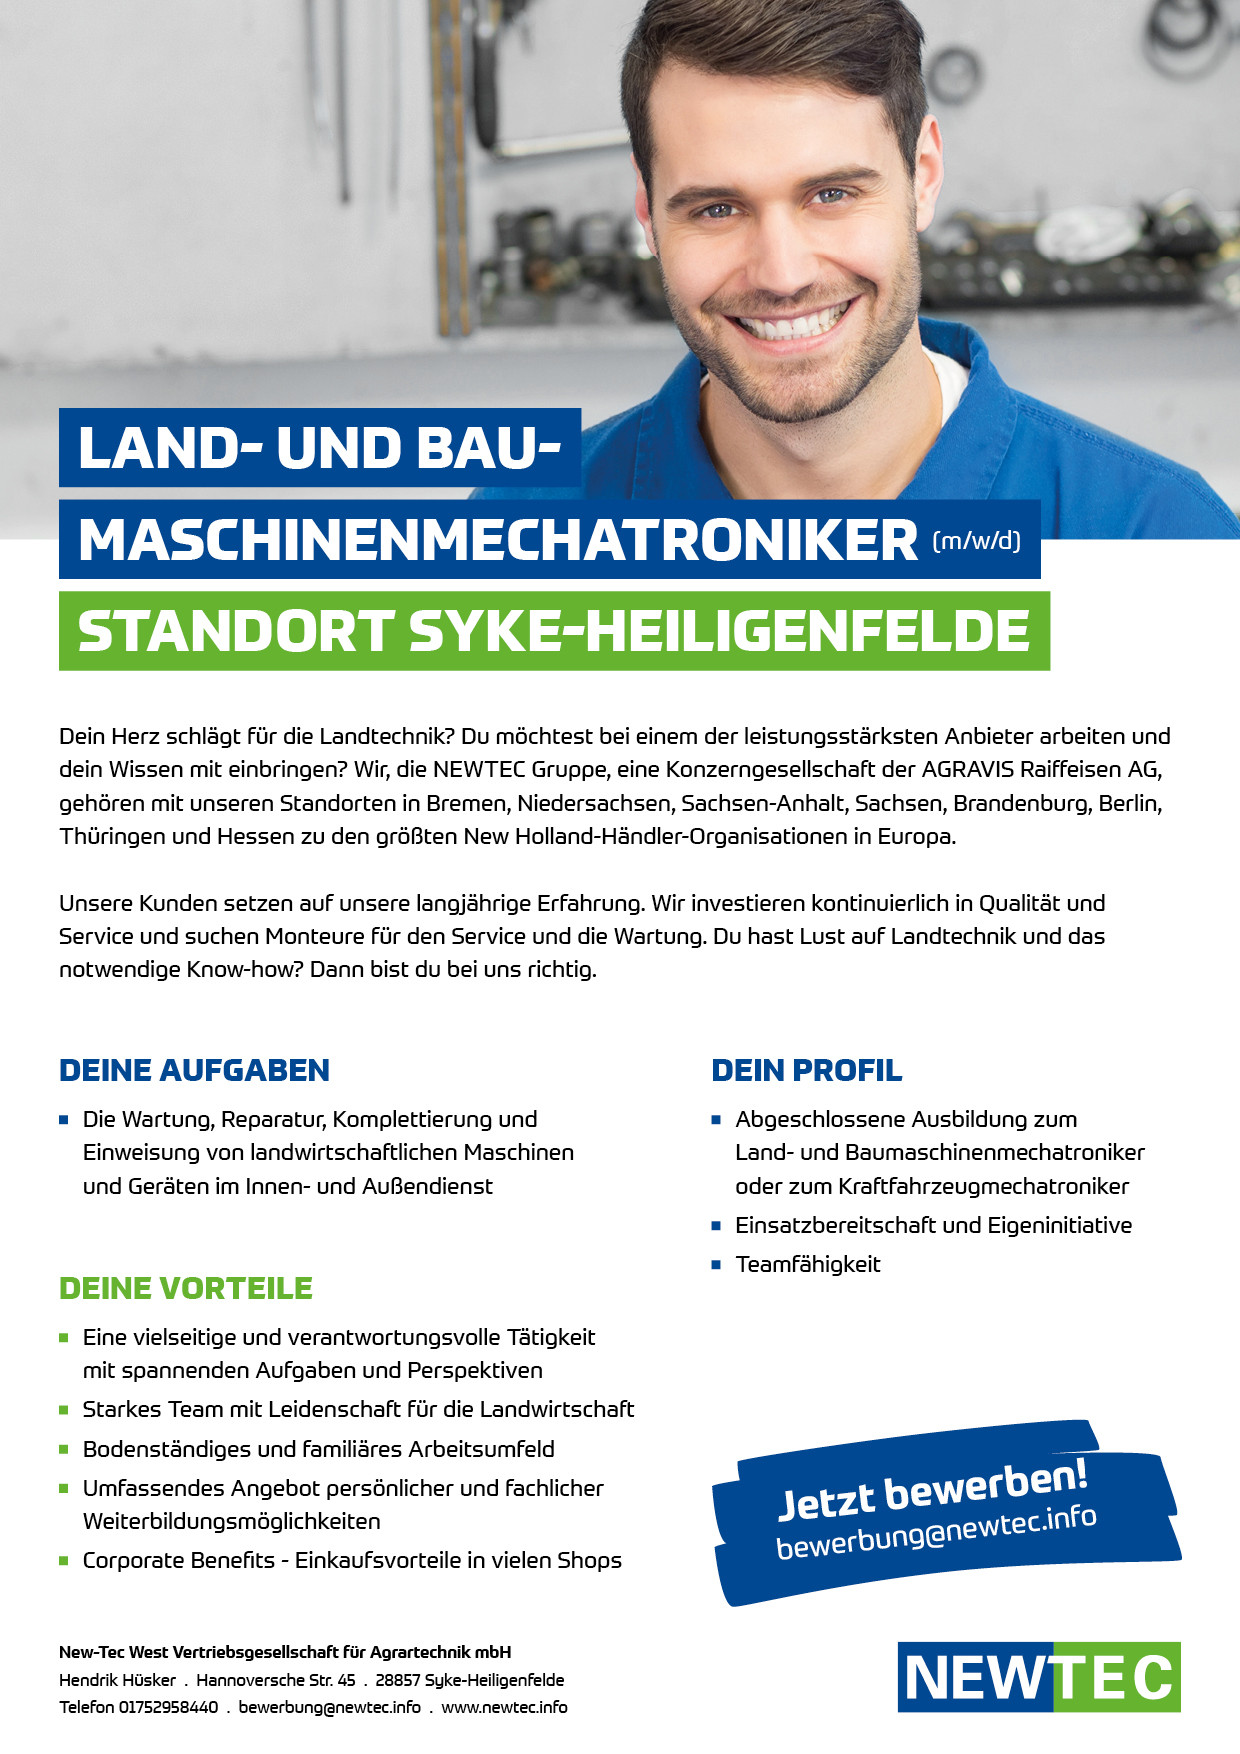 SCREEN TE-NTOST-20-28112 Personalanzeige_Land-_und_Baumaschinenmechatroniker_Syke-Heiligenfelde